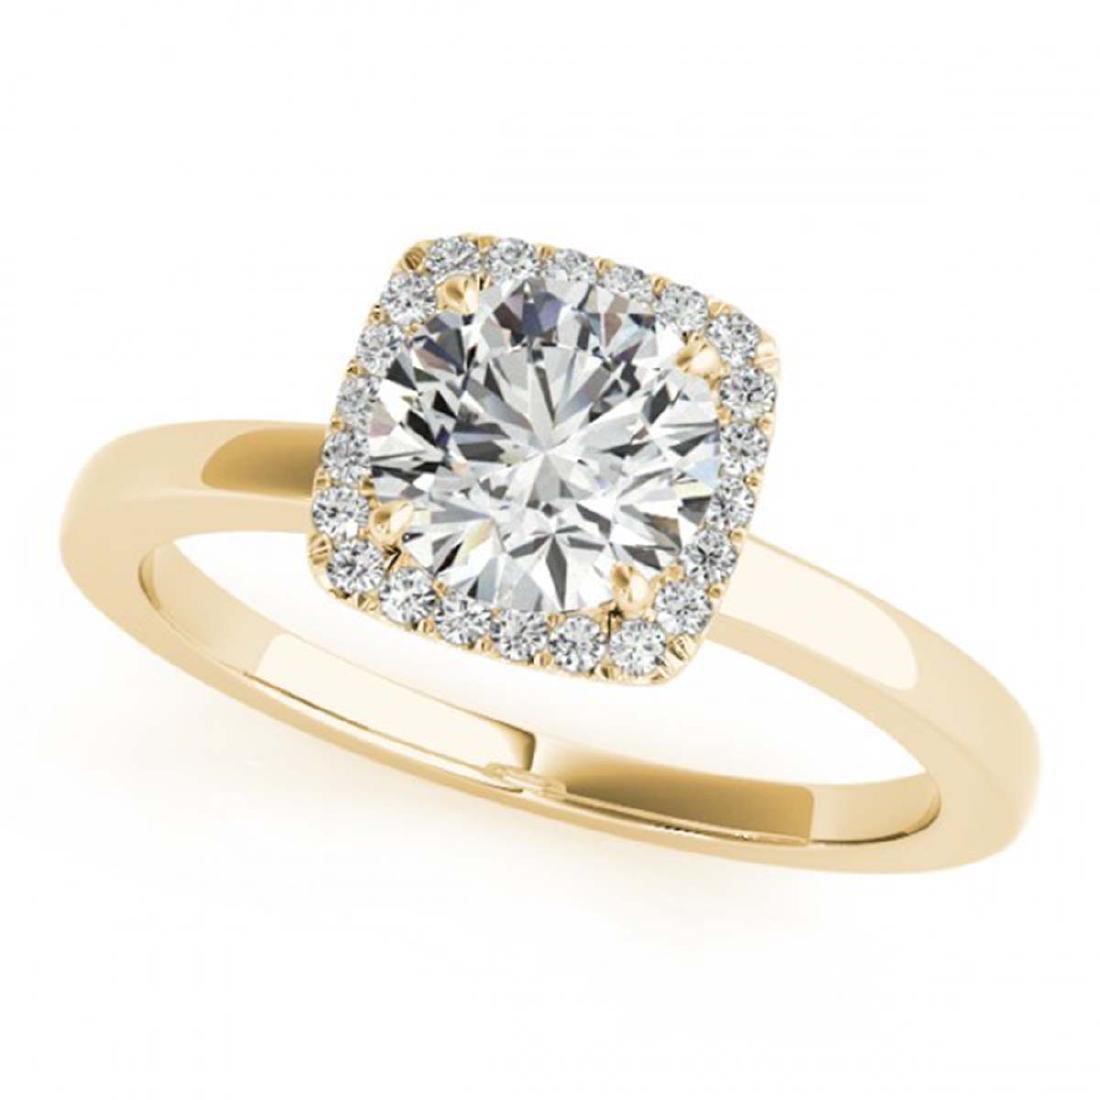 1.15 ctw VS/SI Diamond Halo Ring 18K Yellow Gold -